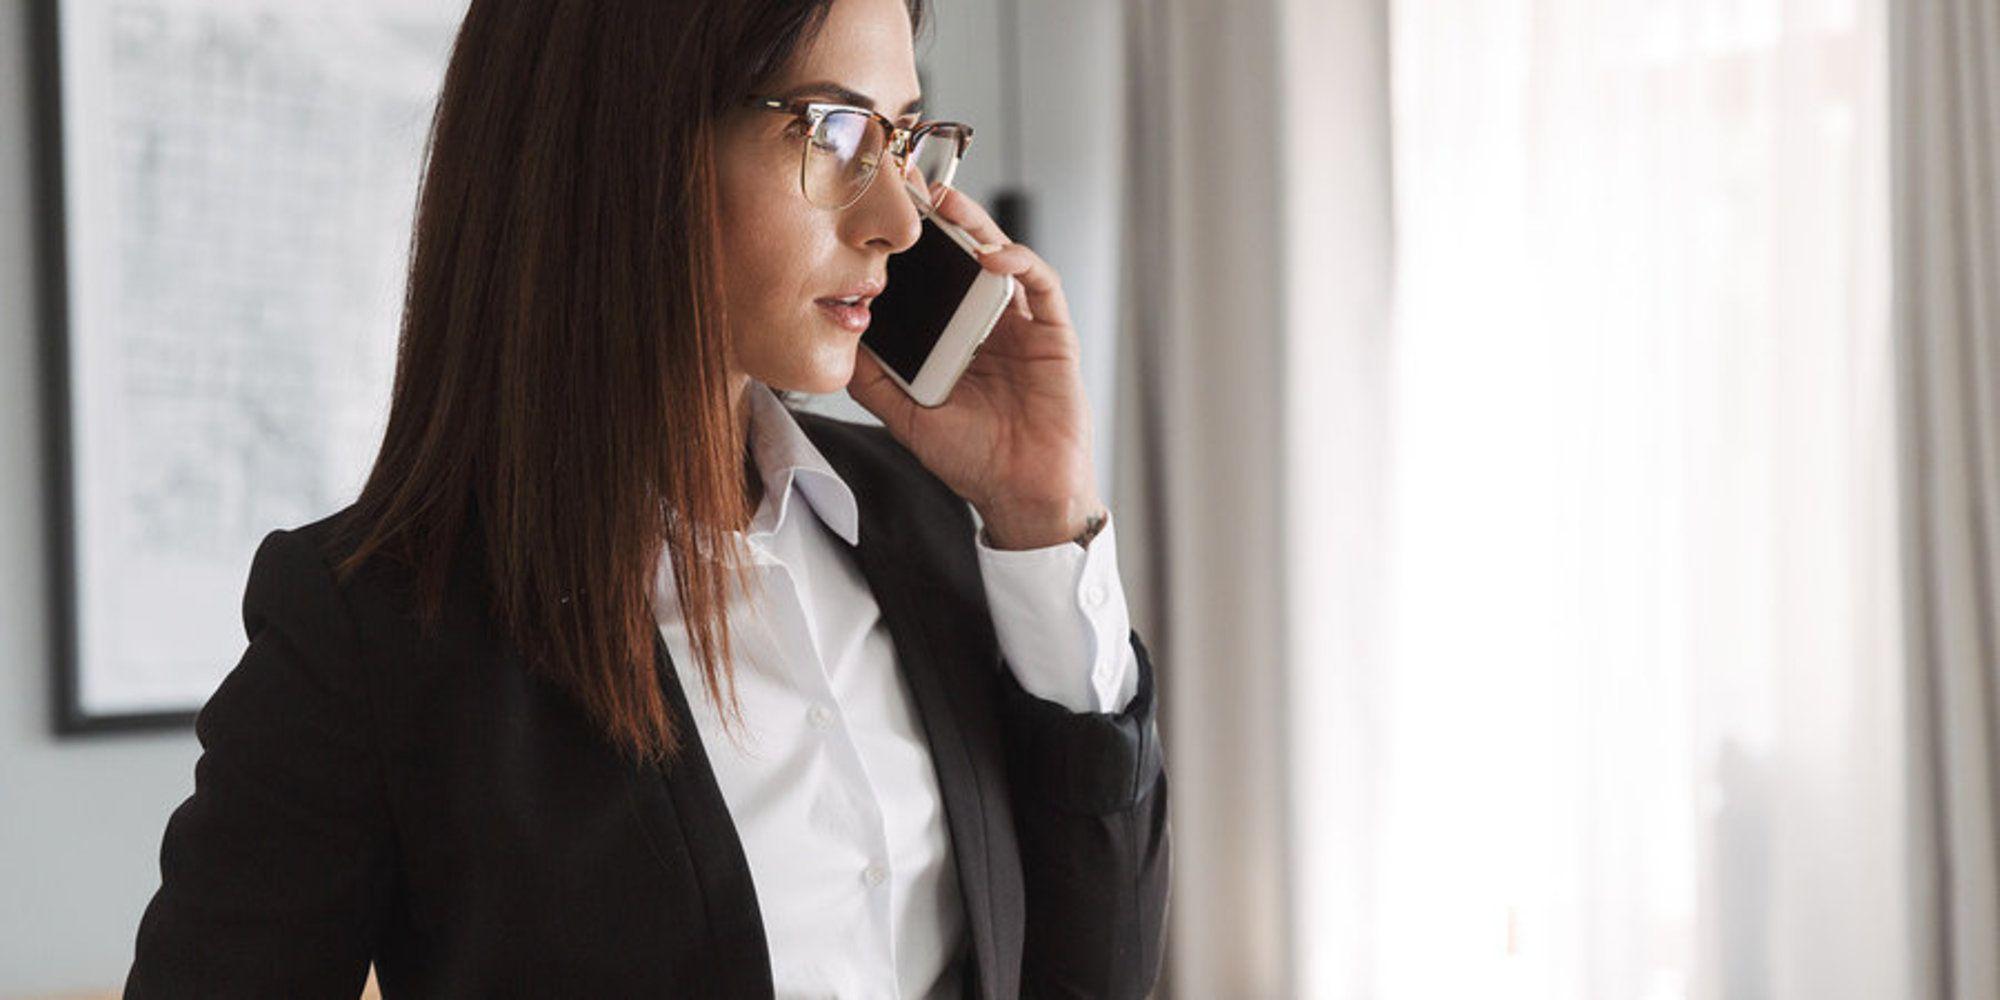 The best way to decline a job offer job offer looking